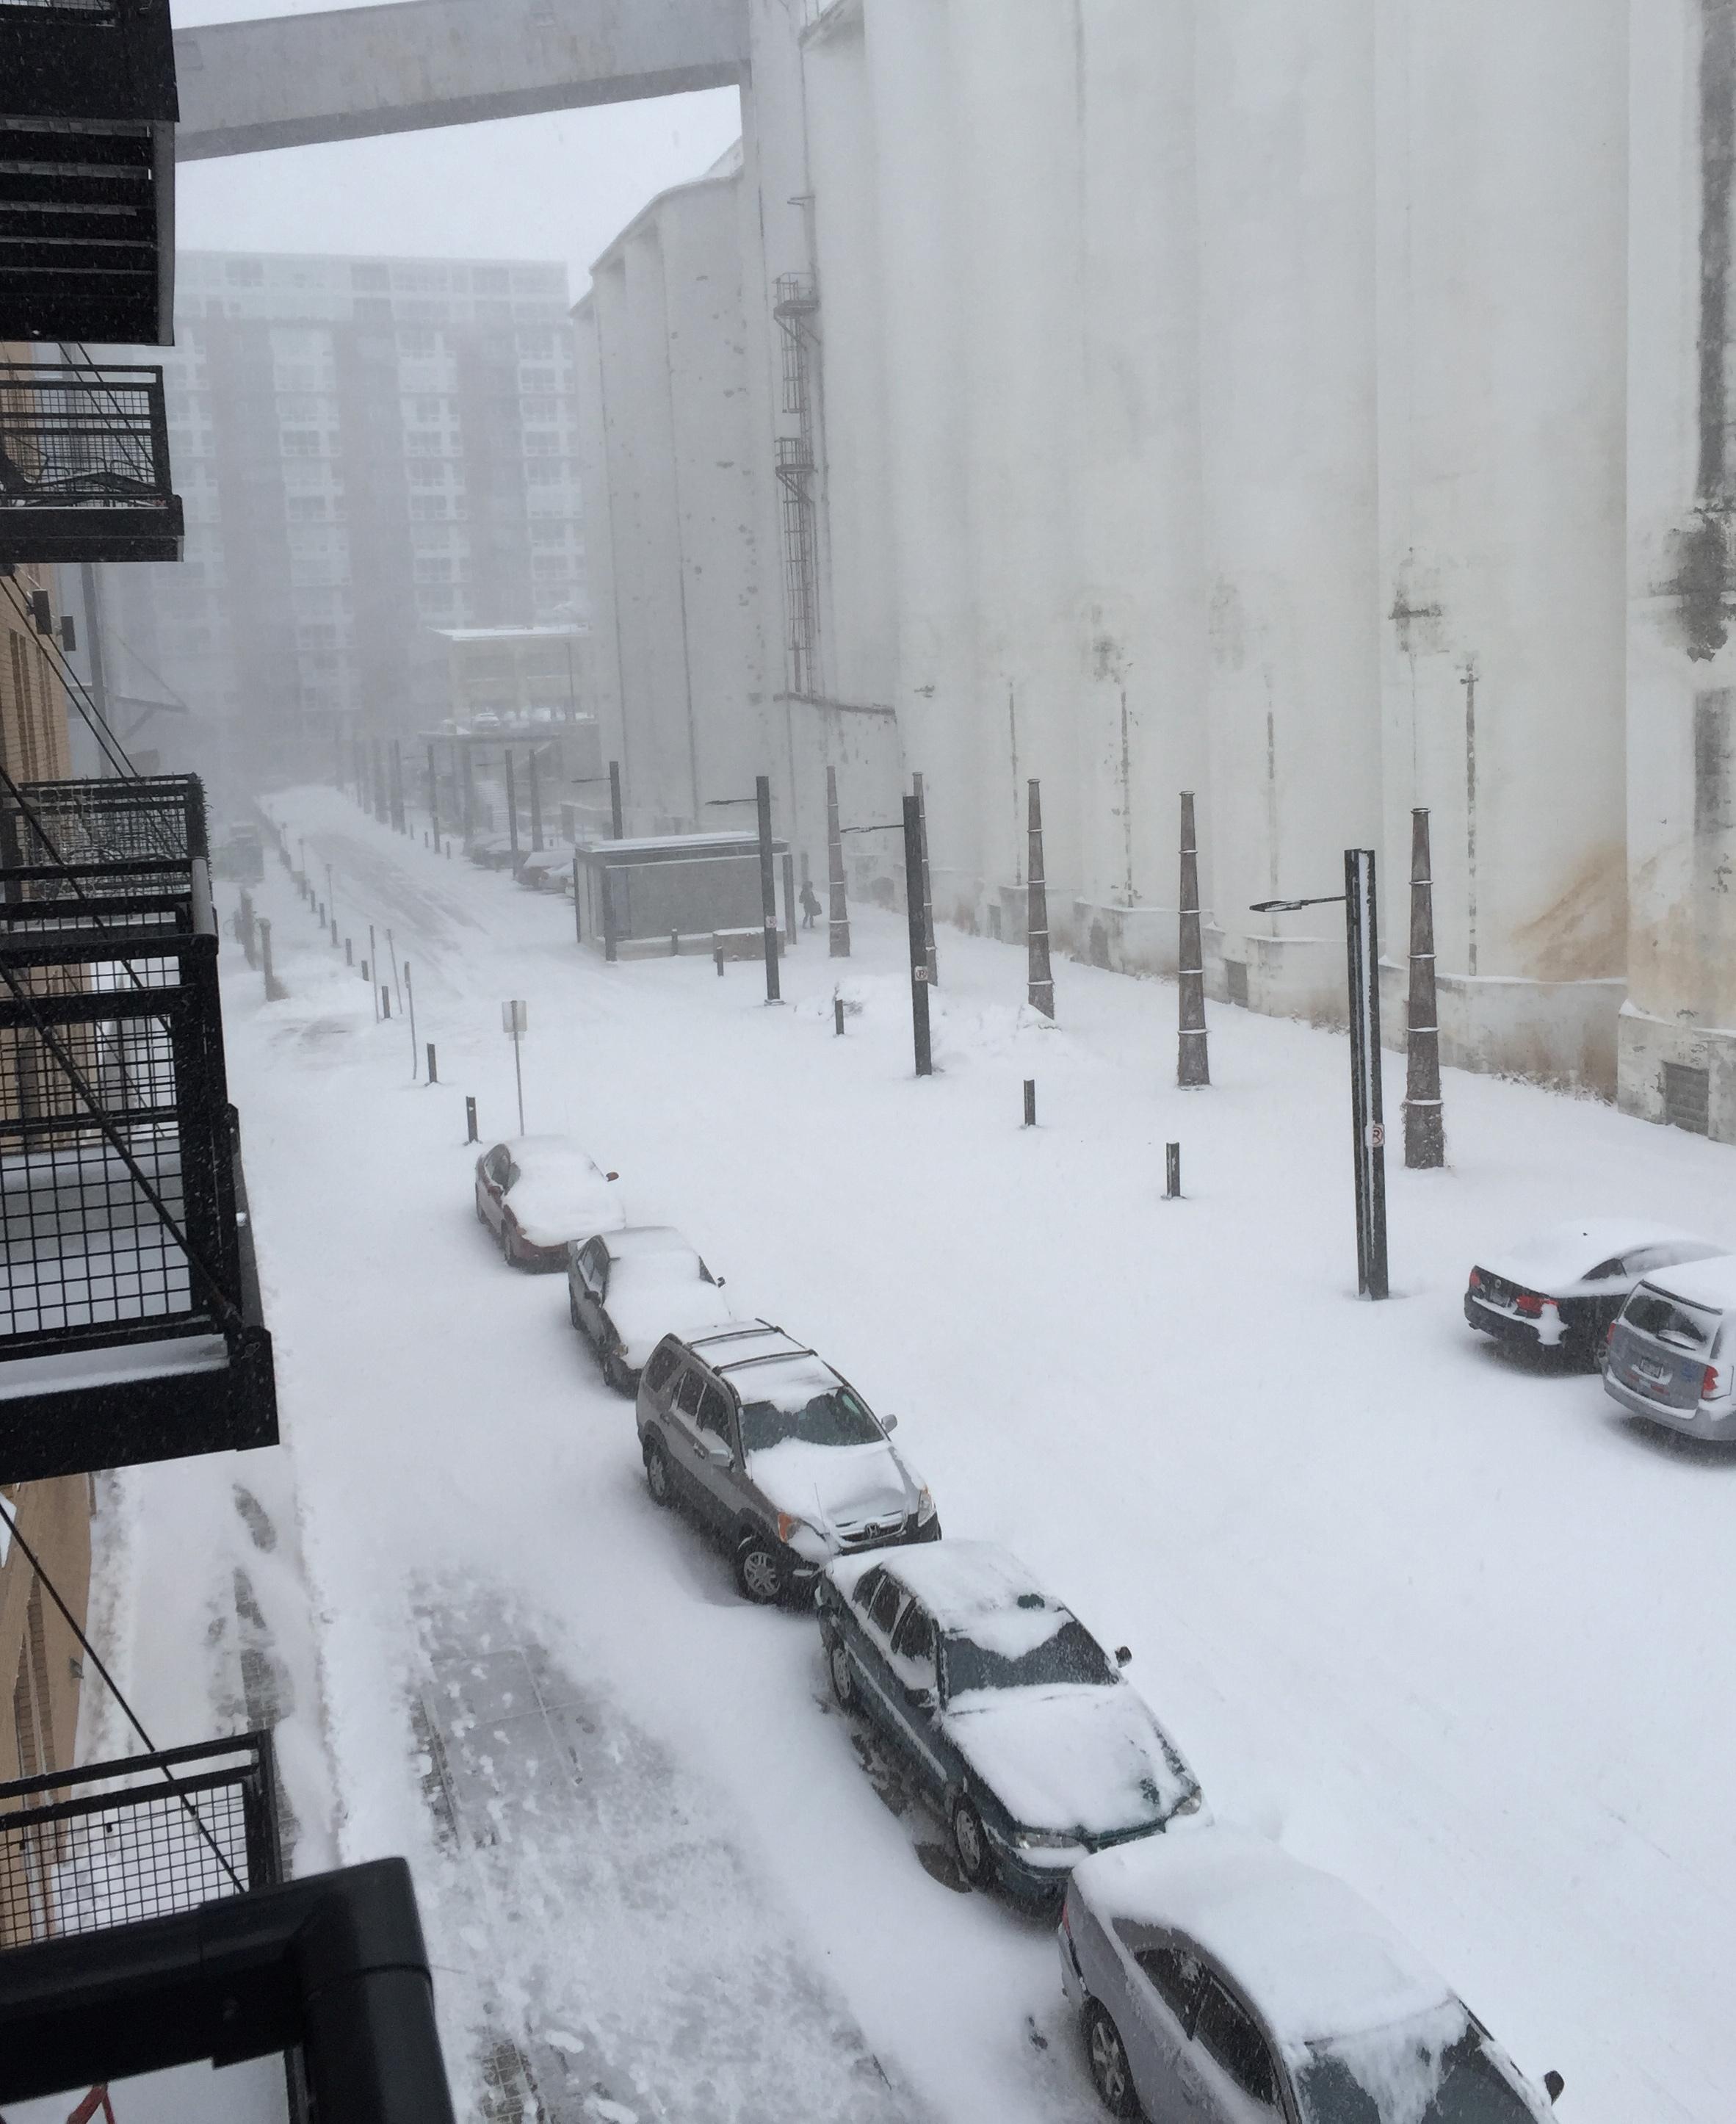 Photos: April blizzard sets snowfall records in Minneapolis